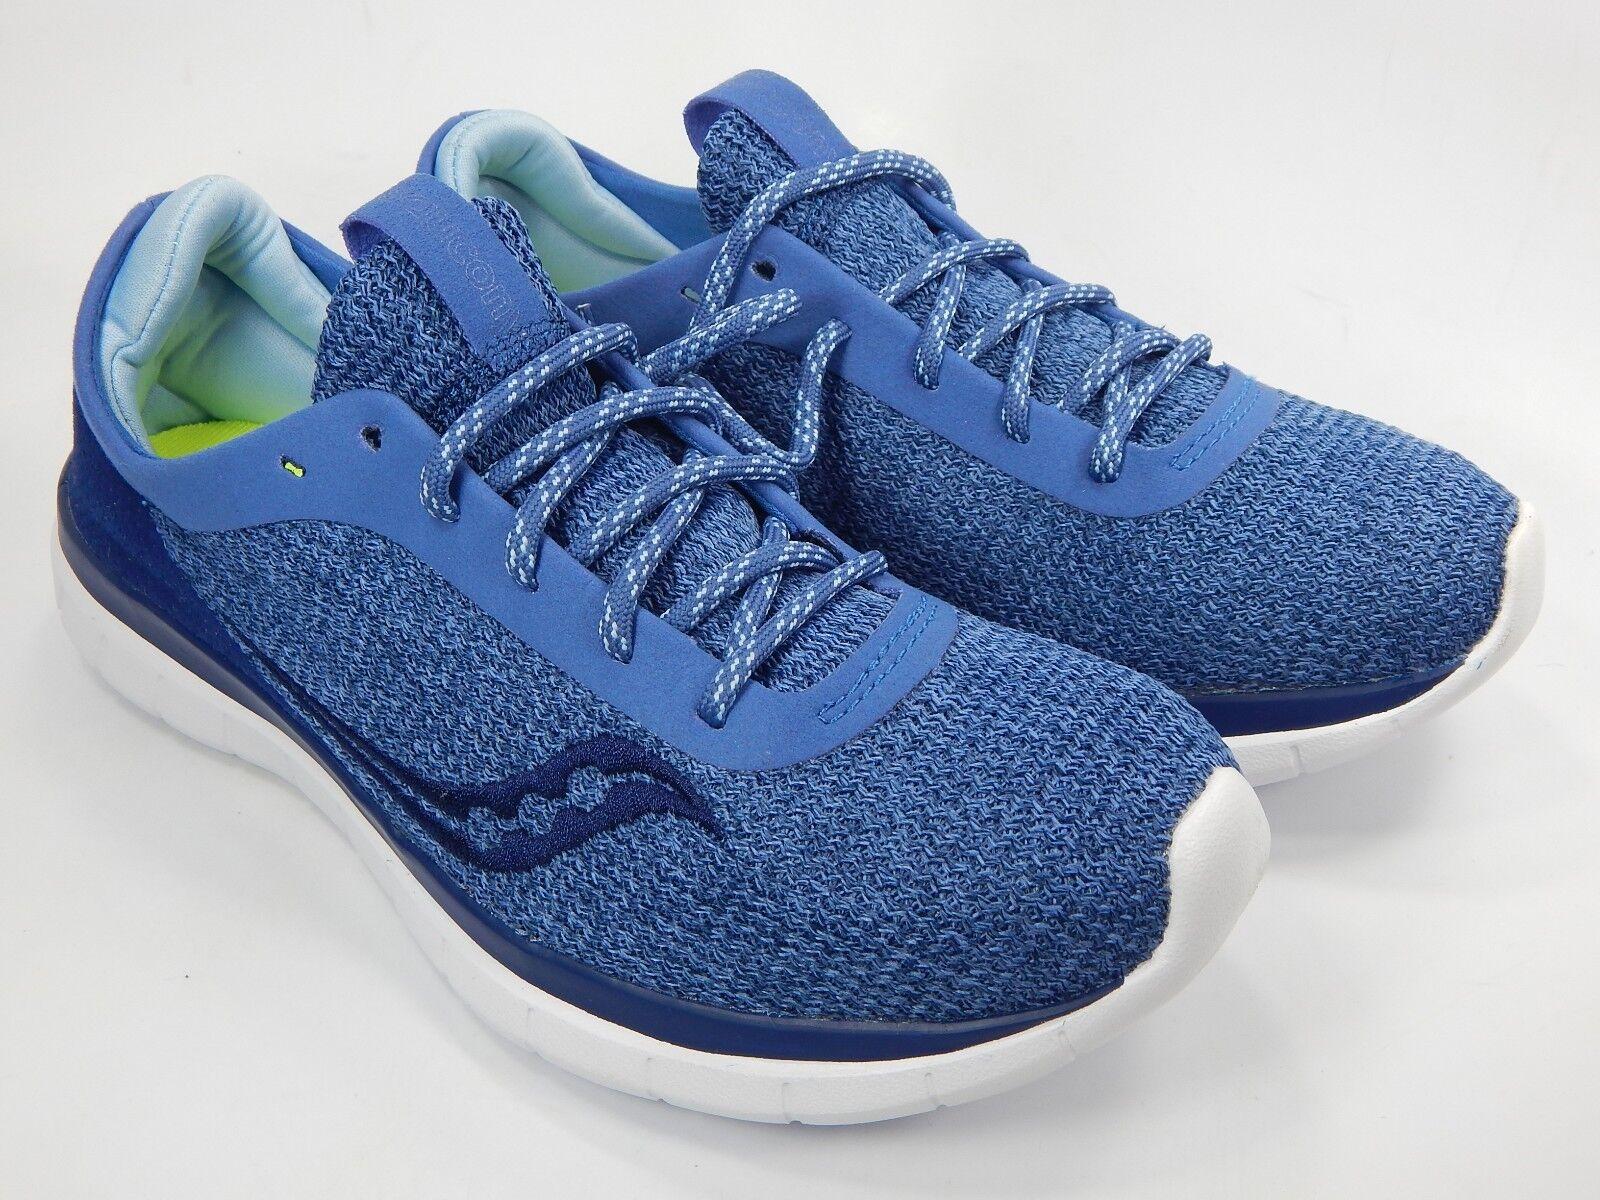 Señoras Nike Roshe 100 dos (GS) Blanco/Plateado Metálico /40/844653 100 Roshe euros c53a02